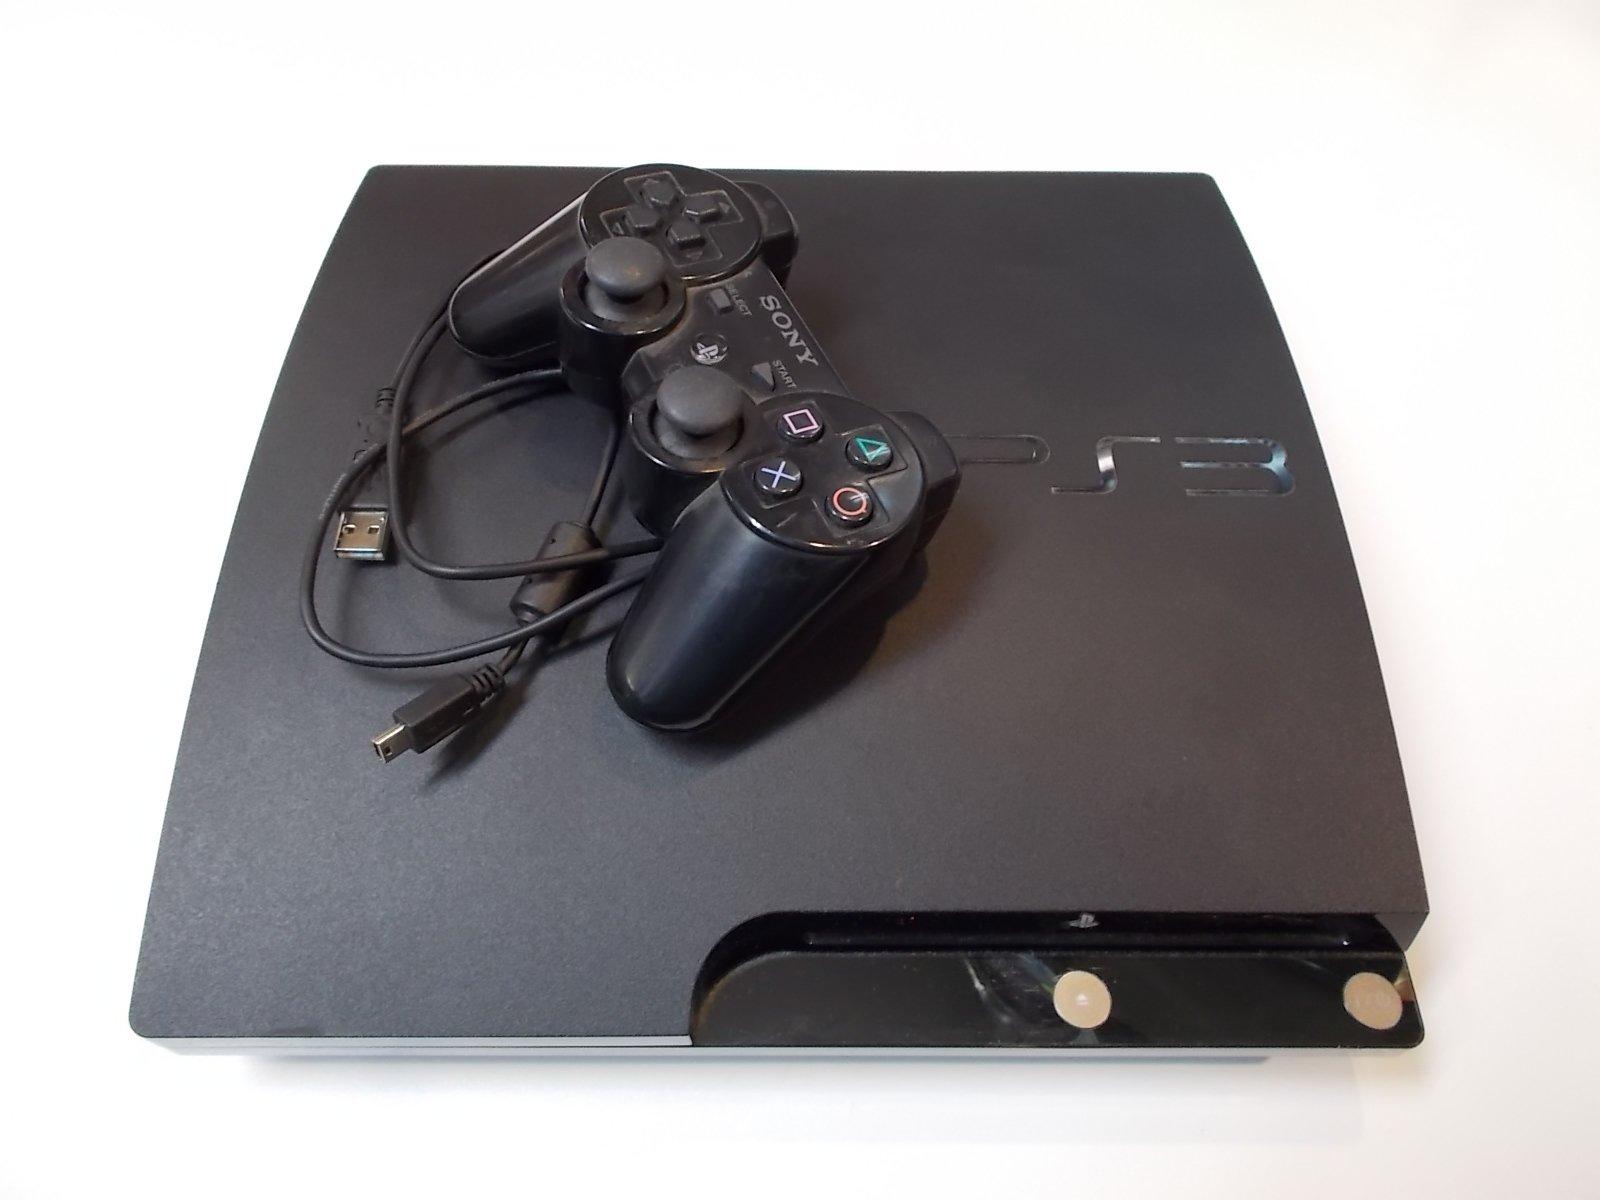 Konsola PlayStation 3 Ps3 250GB + Pad - Opole